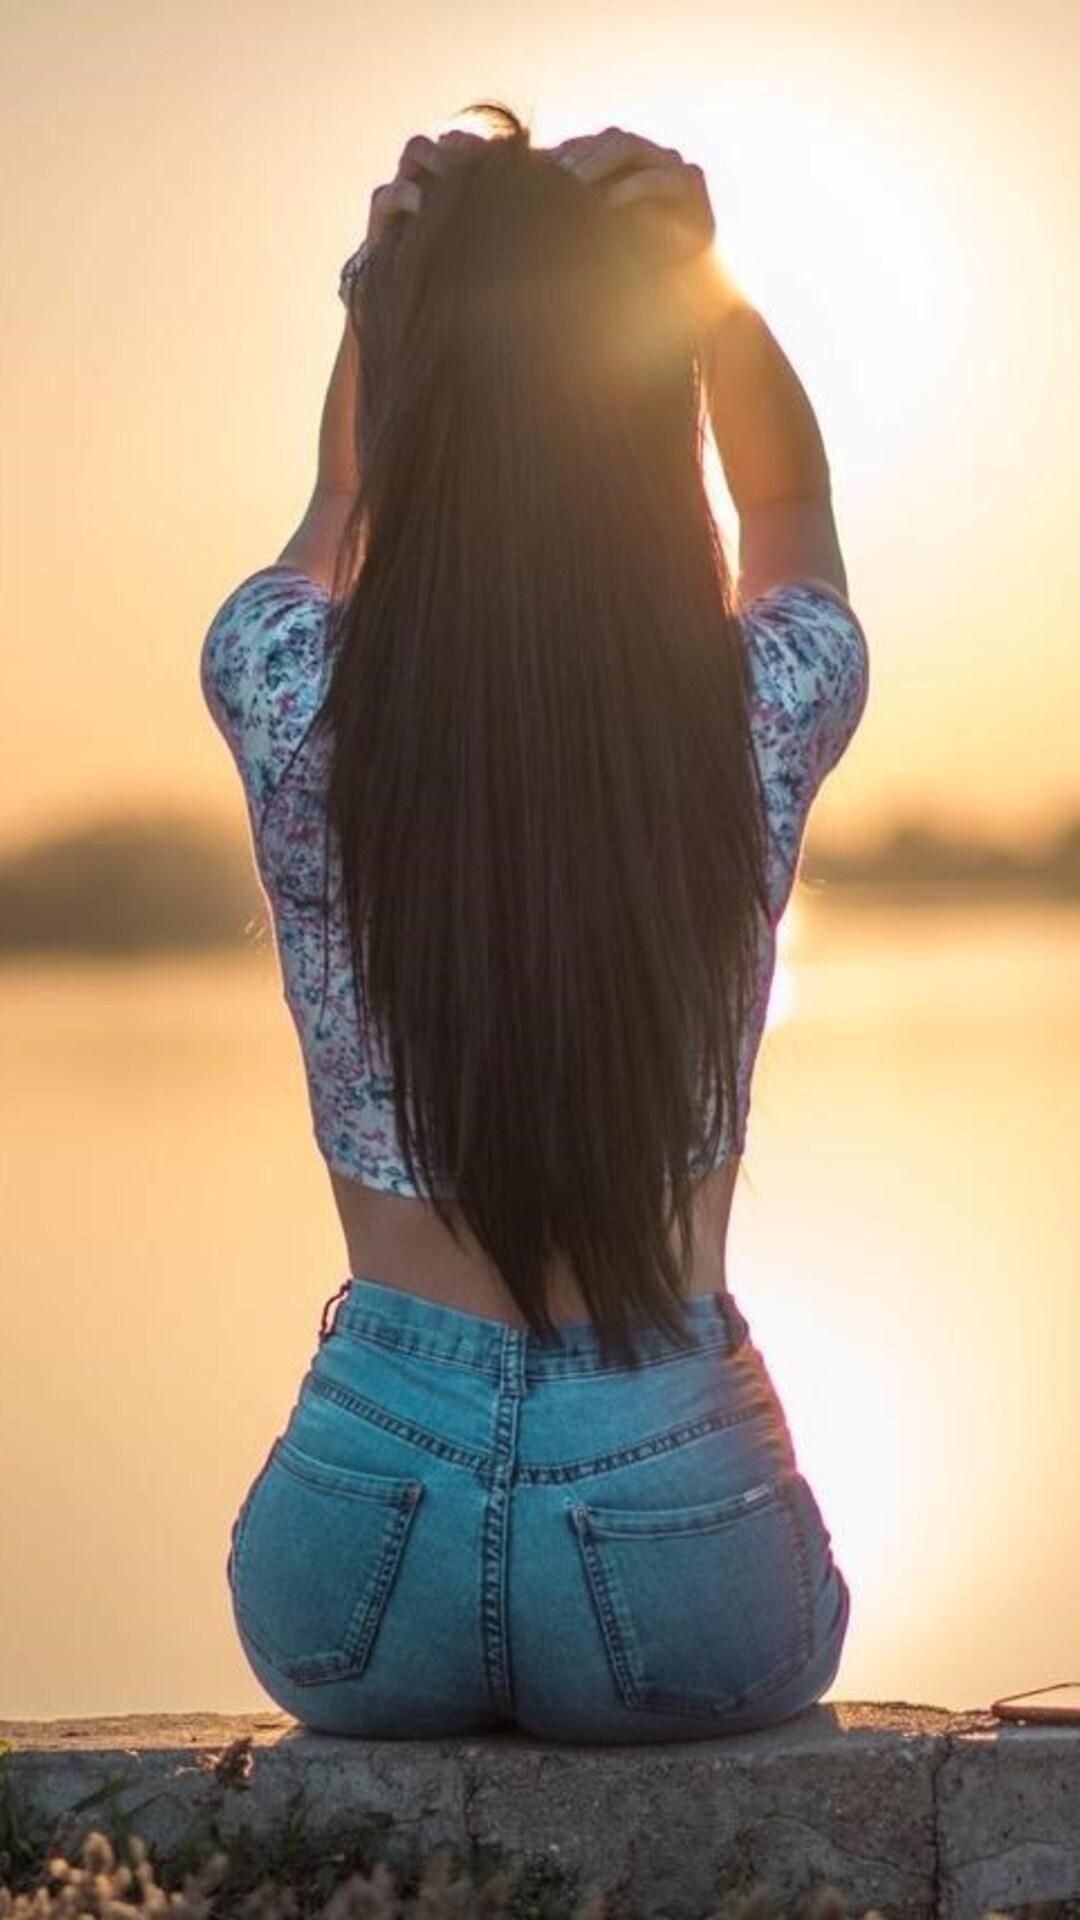 long hair girl sitting alone